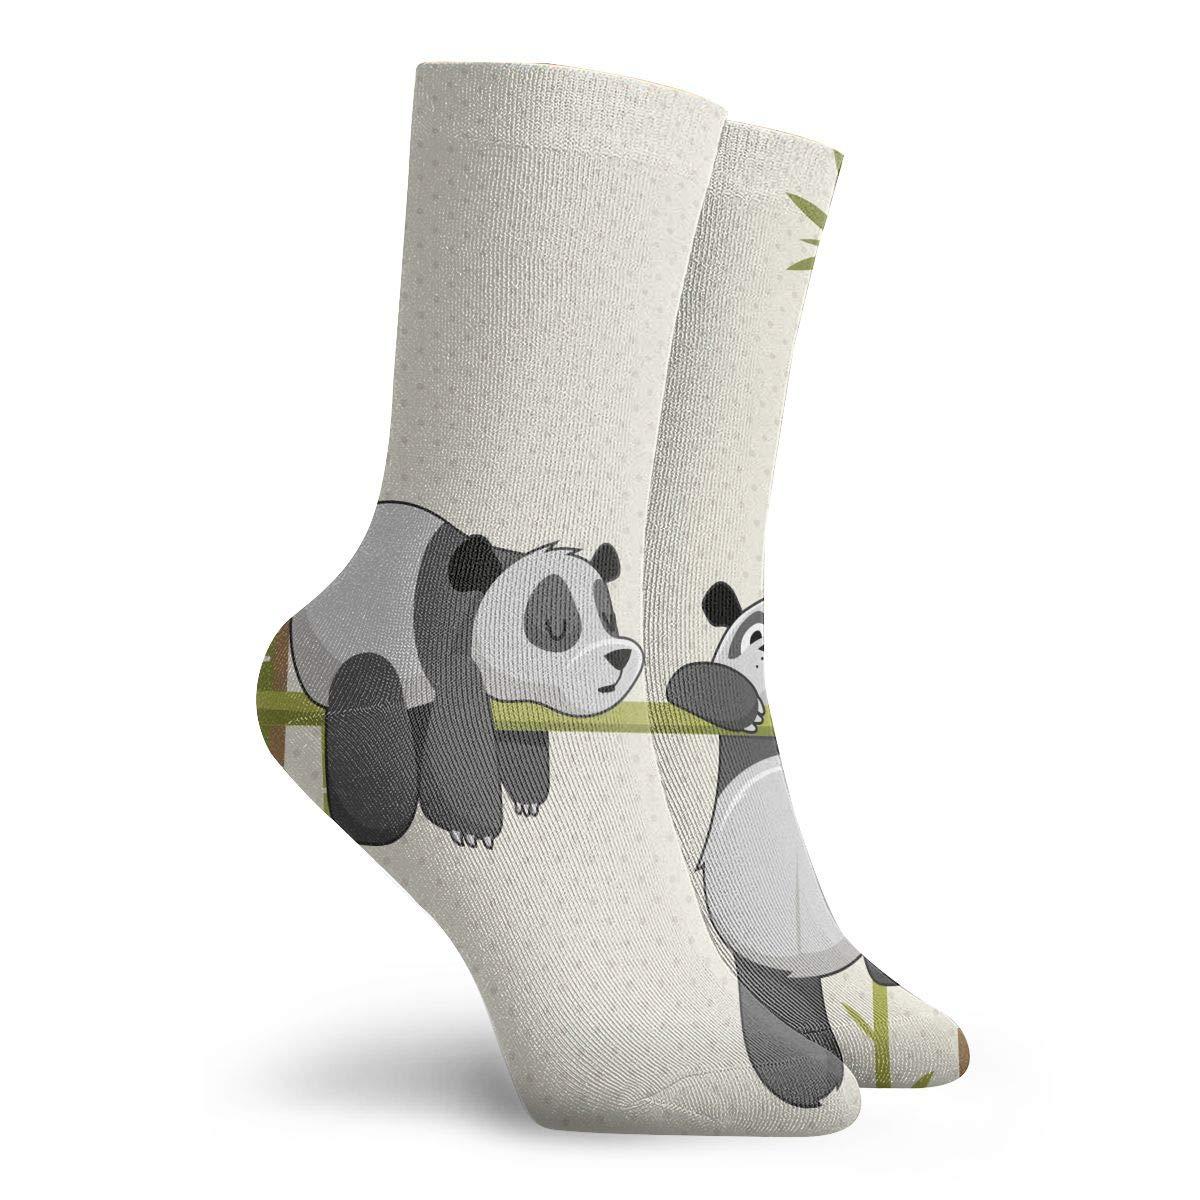 WEEDKEYCAT Cute Panda Sleeping Bamboo Adult Short Socks Cotton Fun Socks for Mens Womens Yoga Hiking Cycling Running Soccer Sports